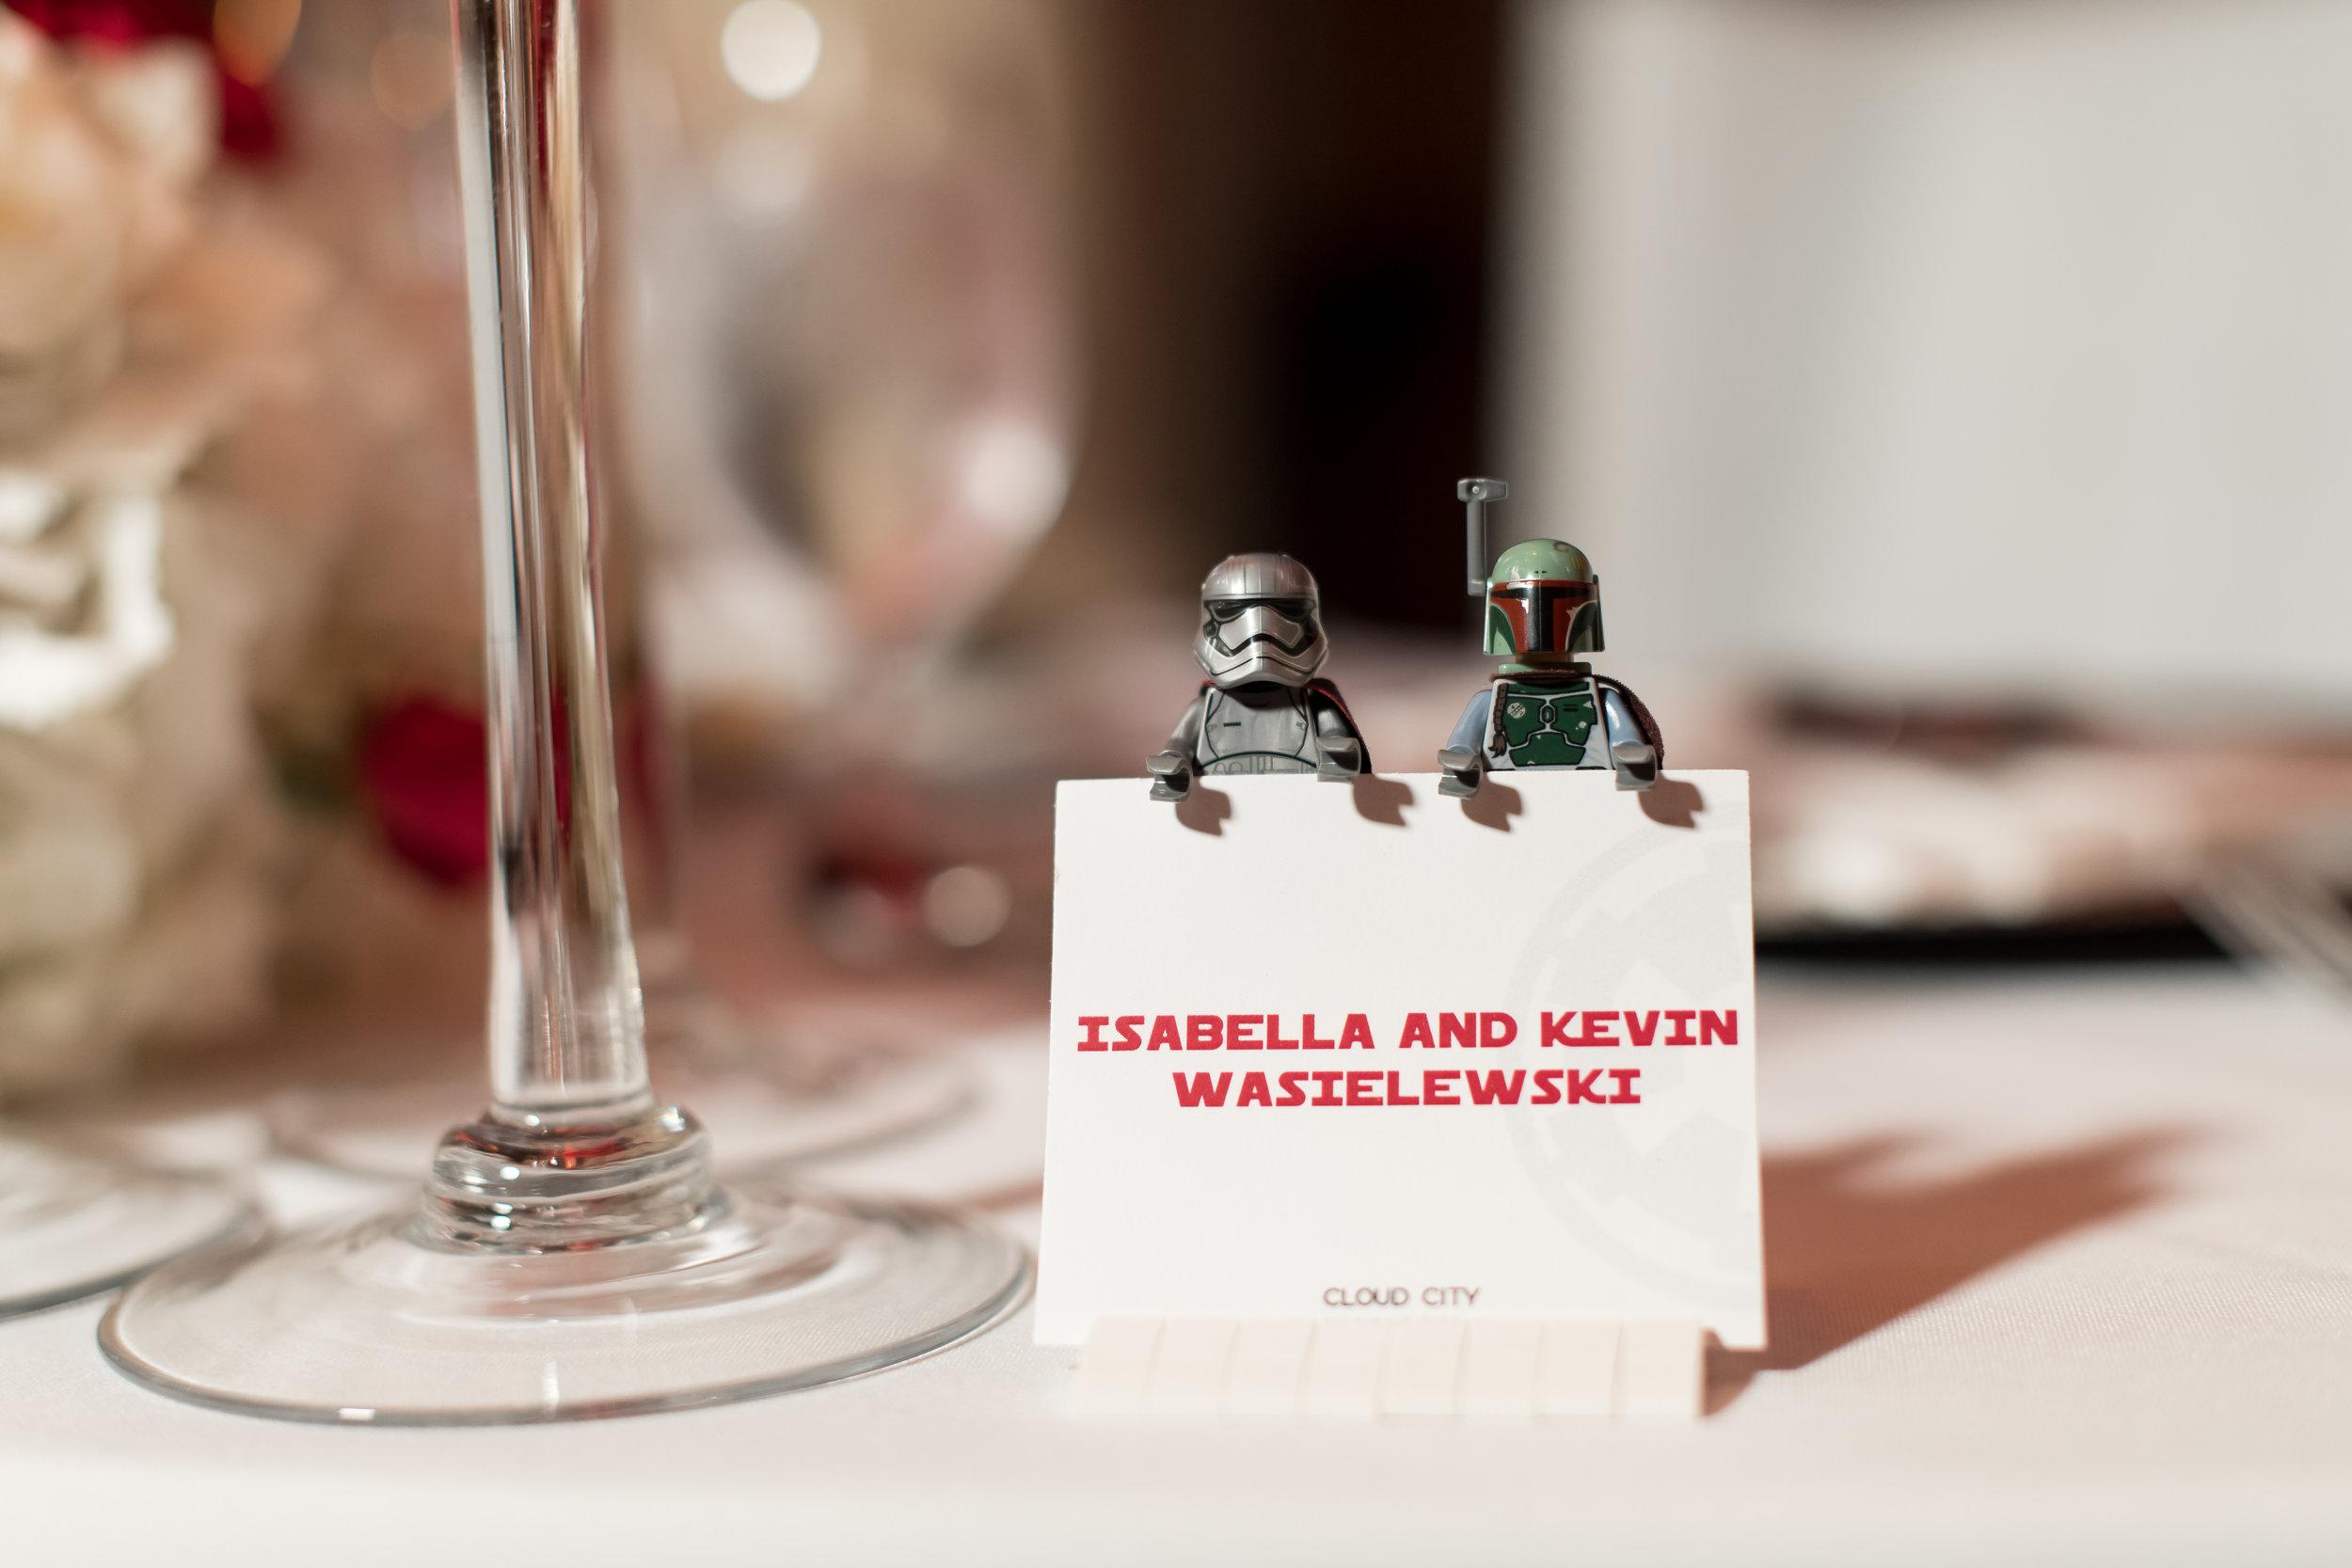 lego Star wars holding wedding  escort cards. Boba Fett and Captain Phasma Lego Figures. Photo shot by  Simply Captivating Photography